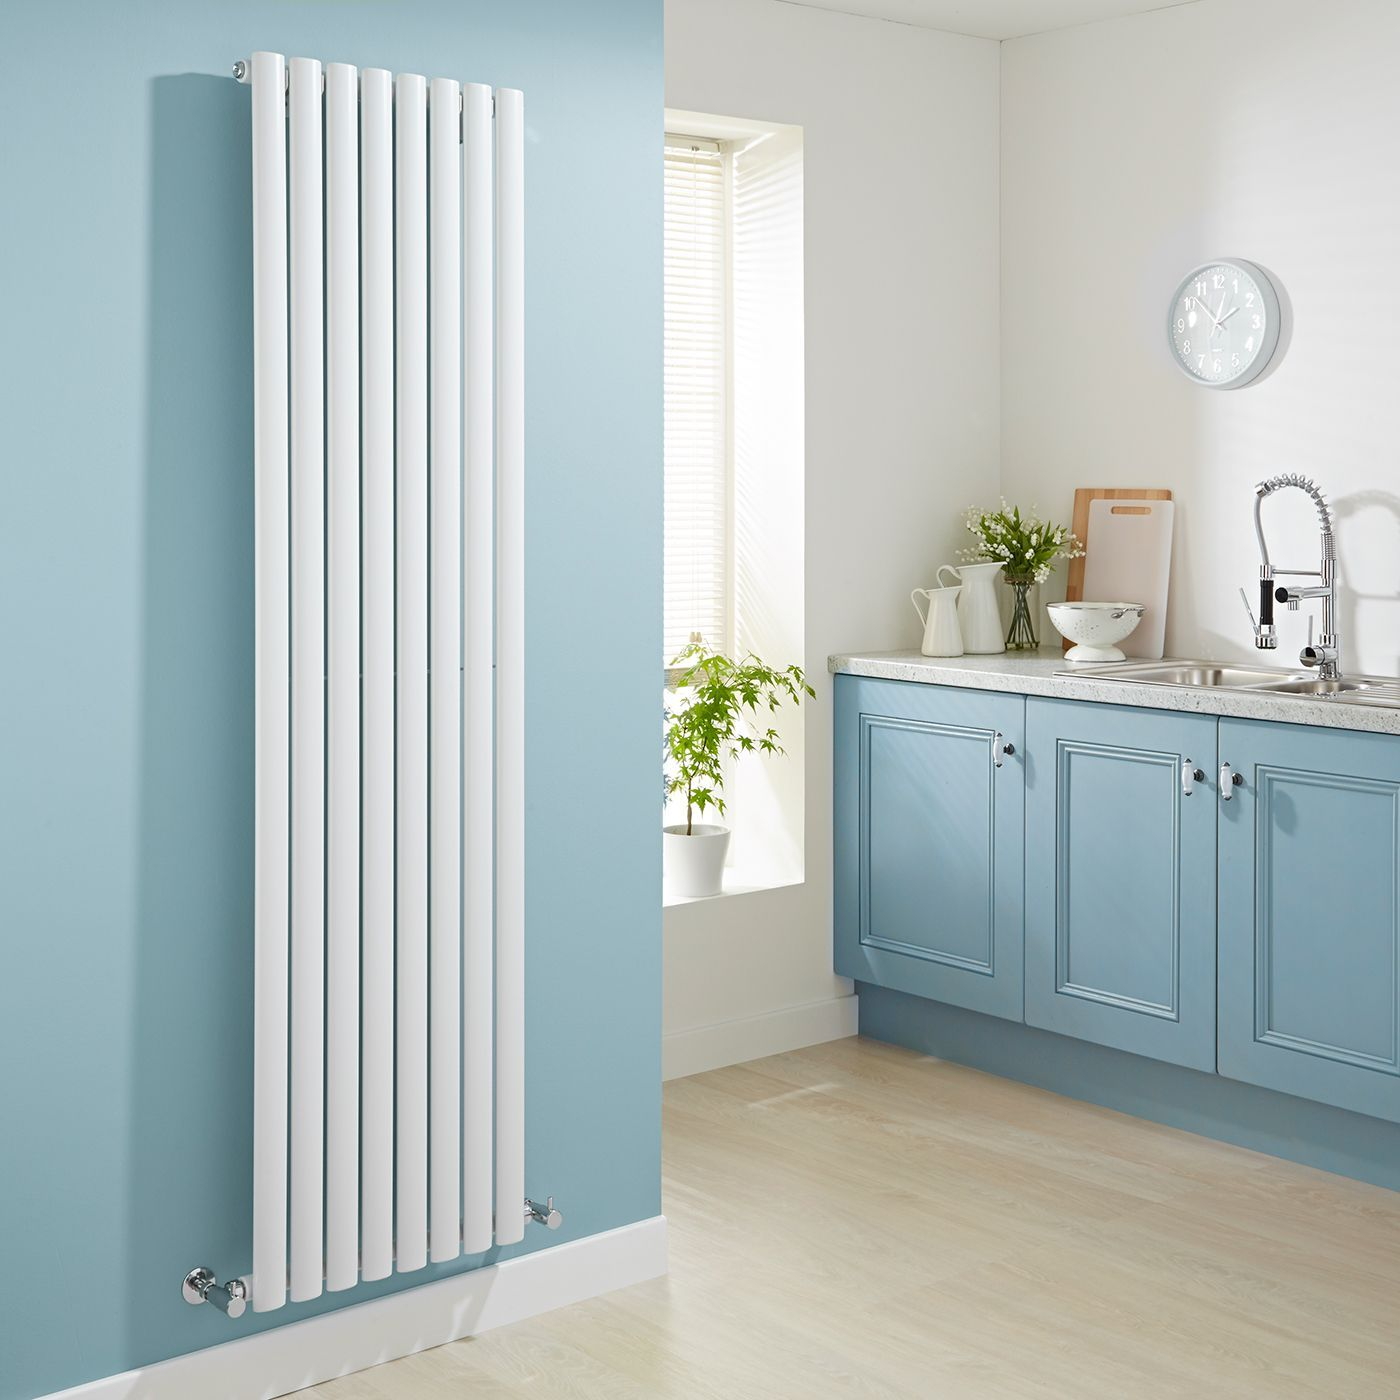 The Best Heating Radiator Buying Guide | Designer radiator ...